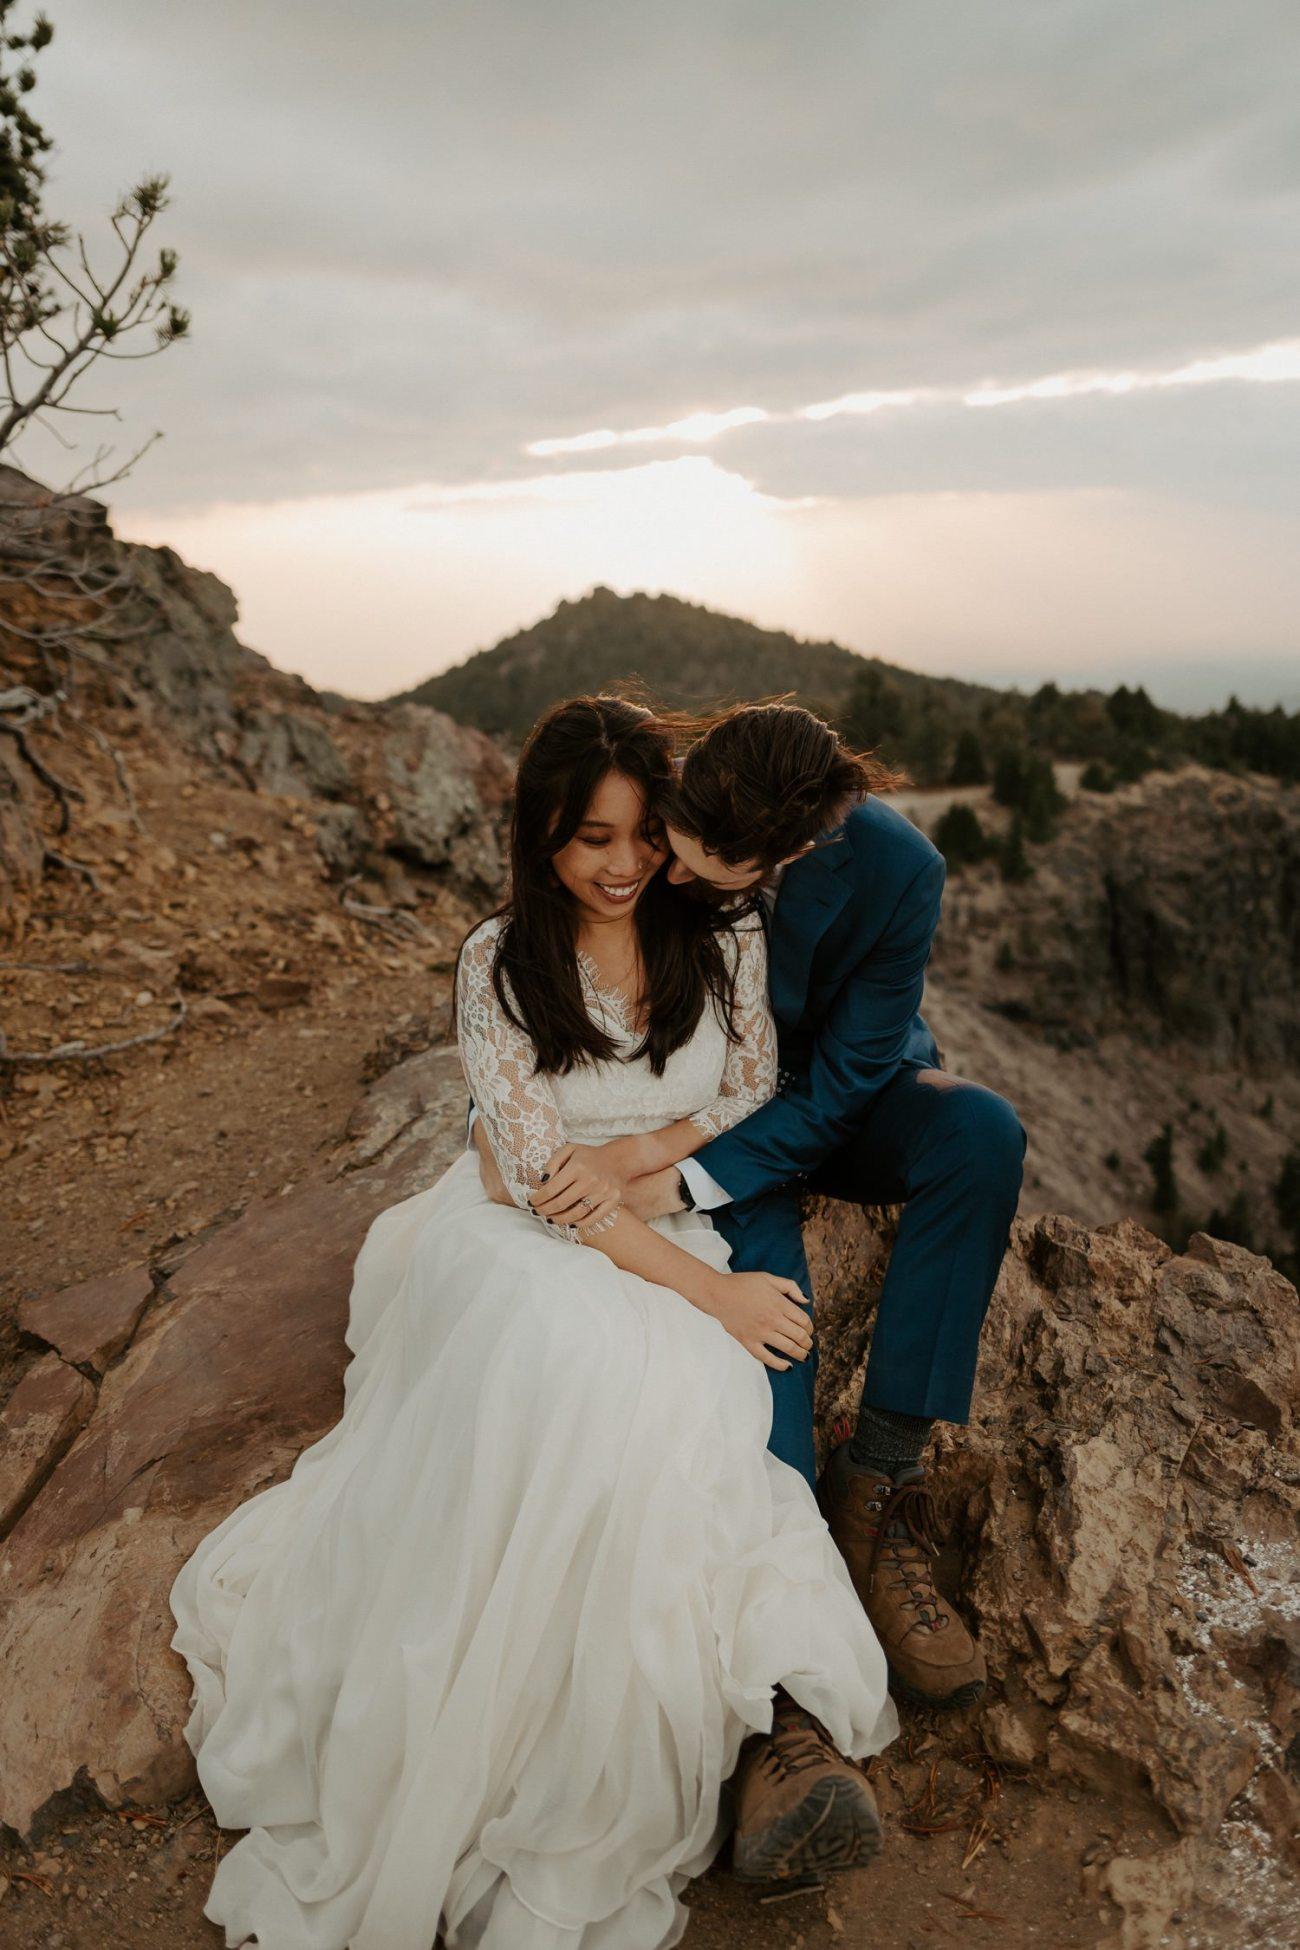 Newberry Volcano Elopement Bend Elopement Bridal Session Bend Wedding Photographer Anais Possamai Photography 032